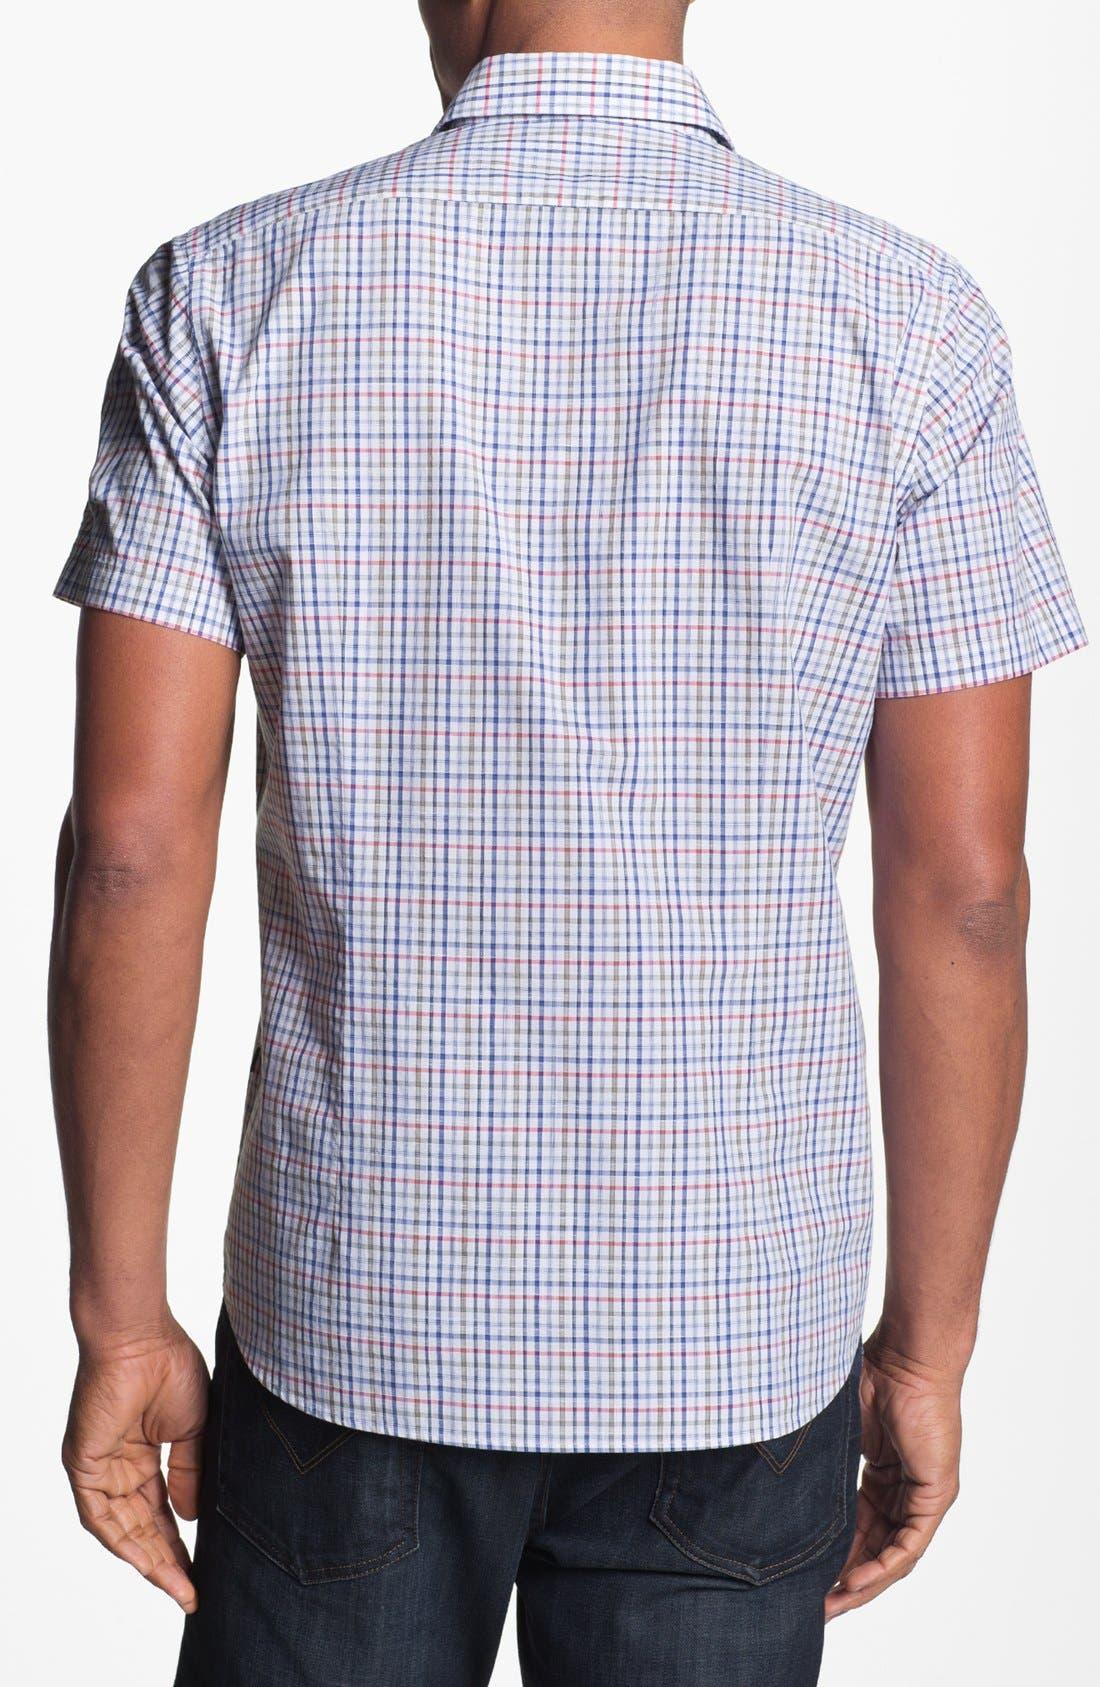 Alternate Image 2  - BOSS HUGO BOSS 'Kenny' Regular Fit Plaid Short Sleeve Sport Shirt